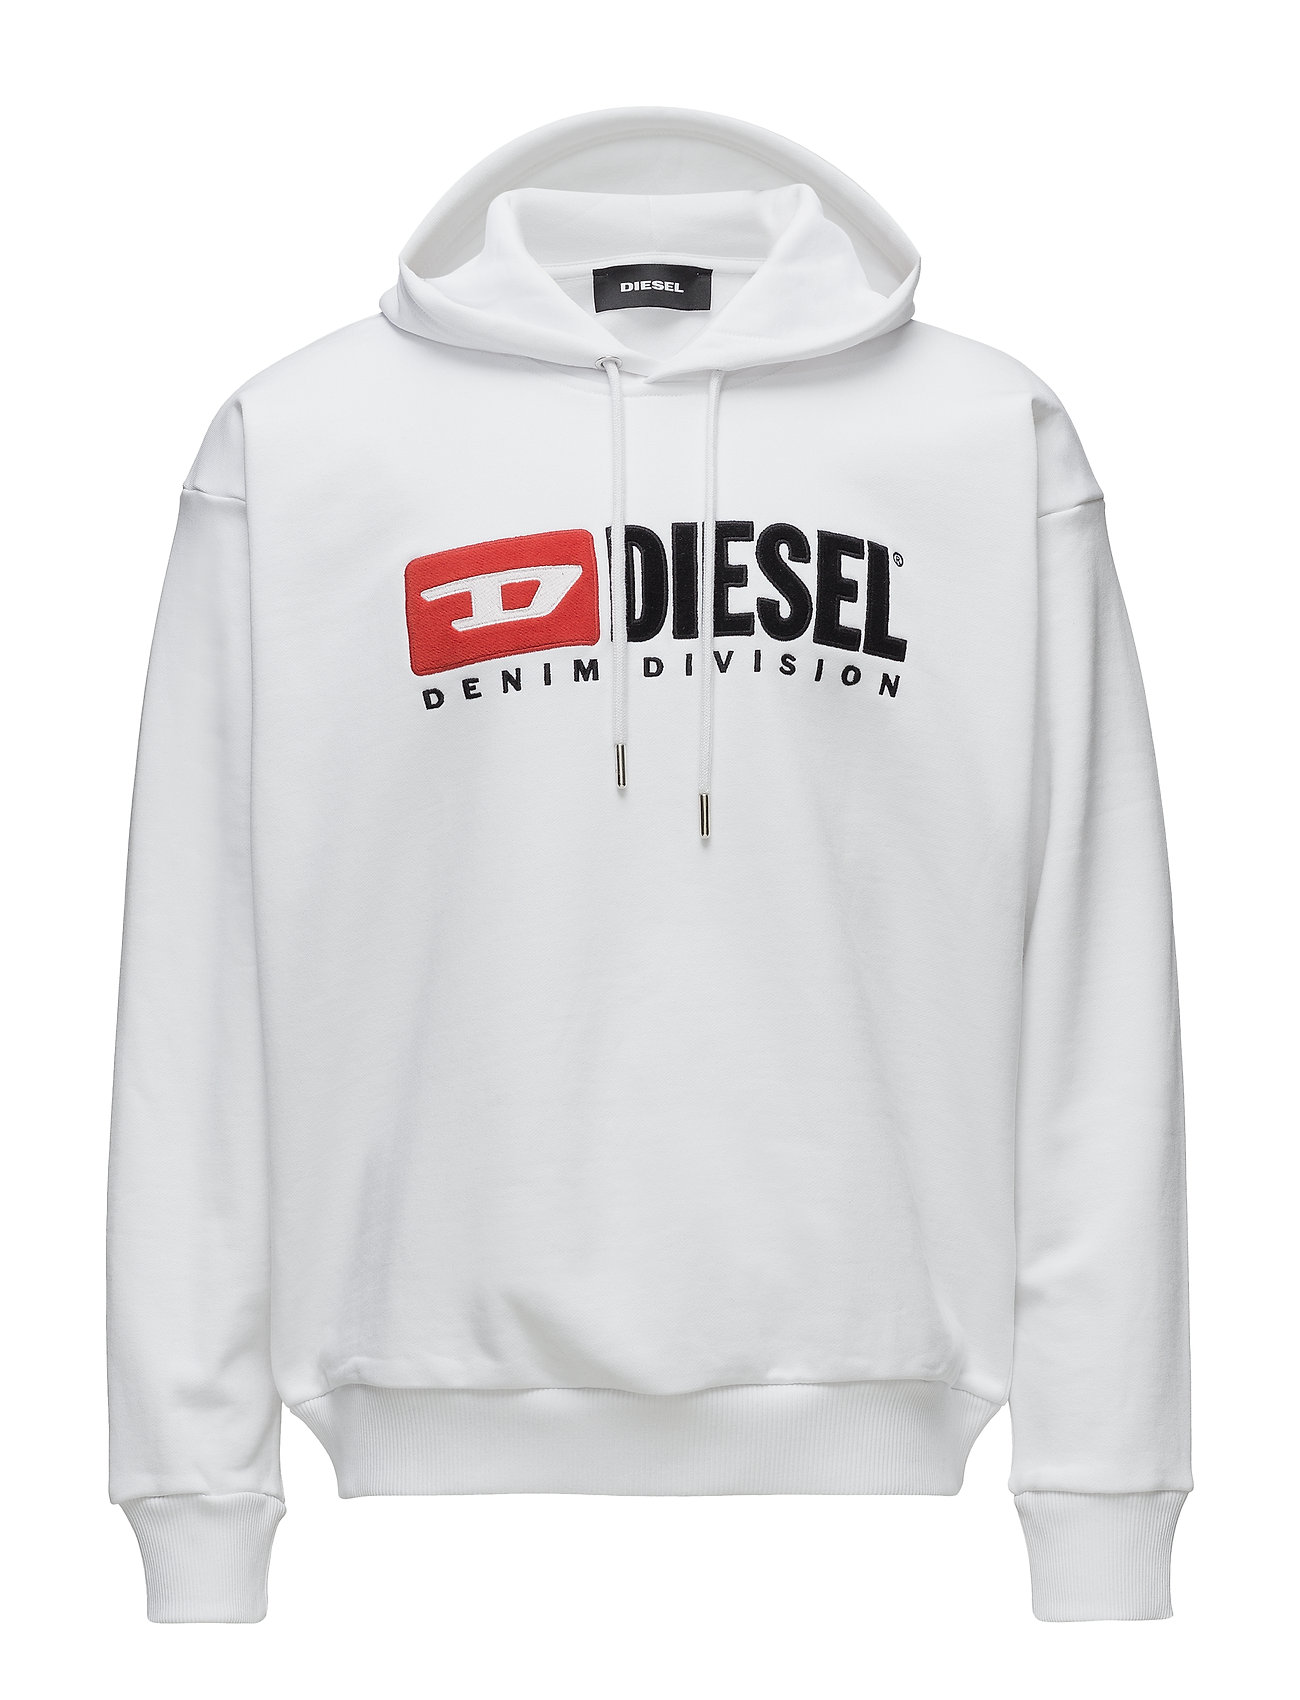 Diesel Men S-DIVISION SWEAT-SHIRT - BRIGHT WHITE